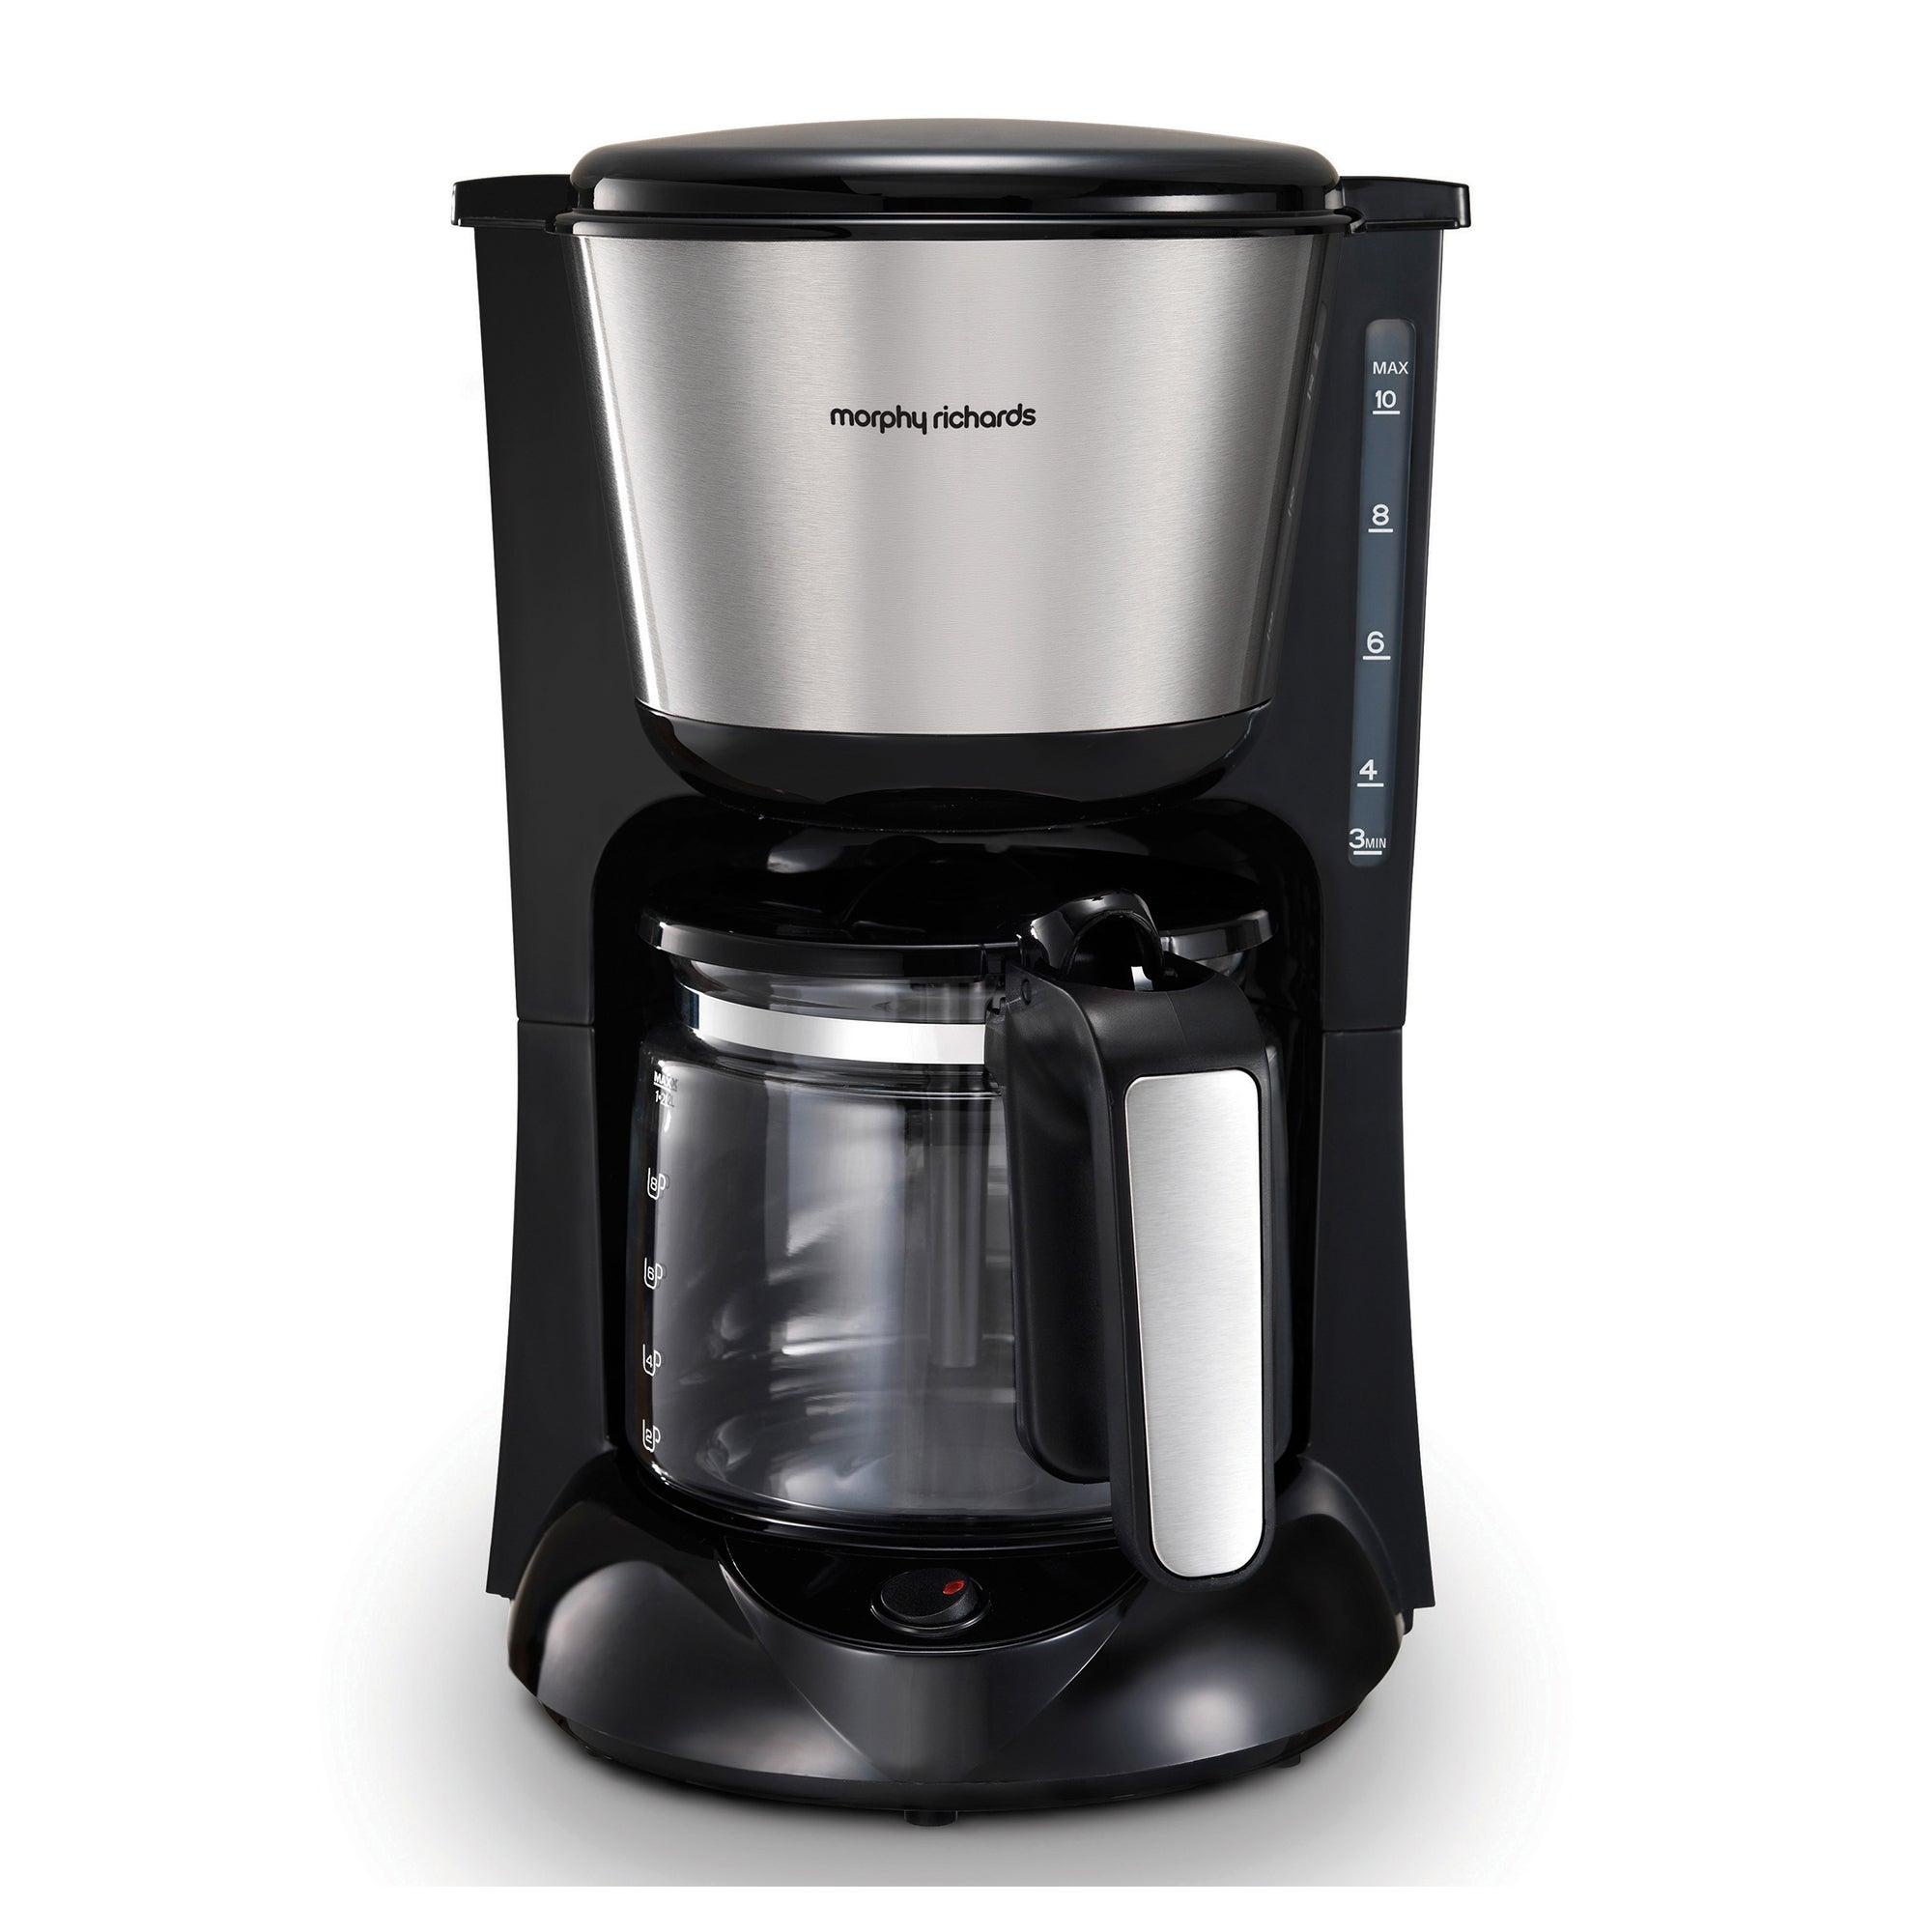 Morphy Richards Equip Filter Coffee Machine Black